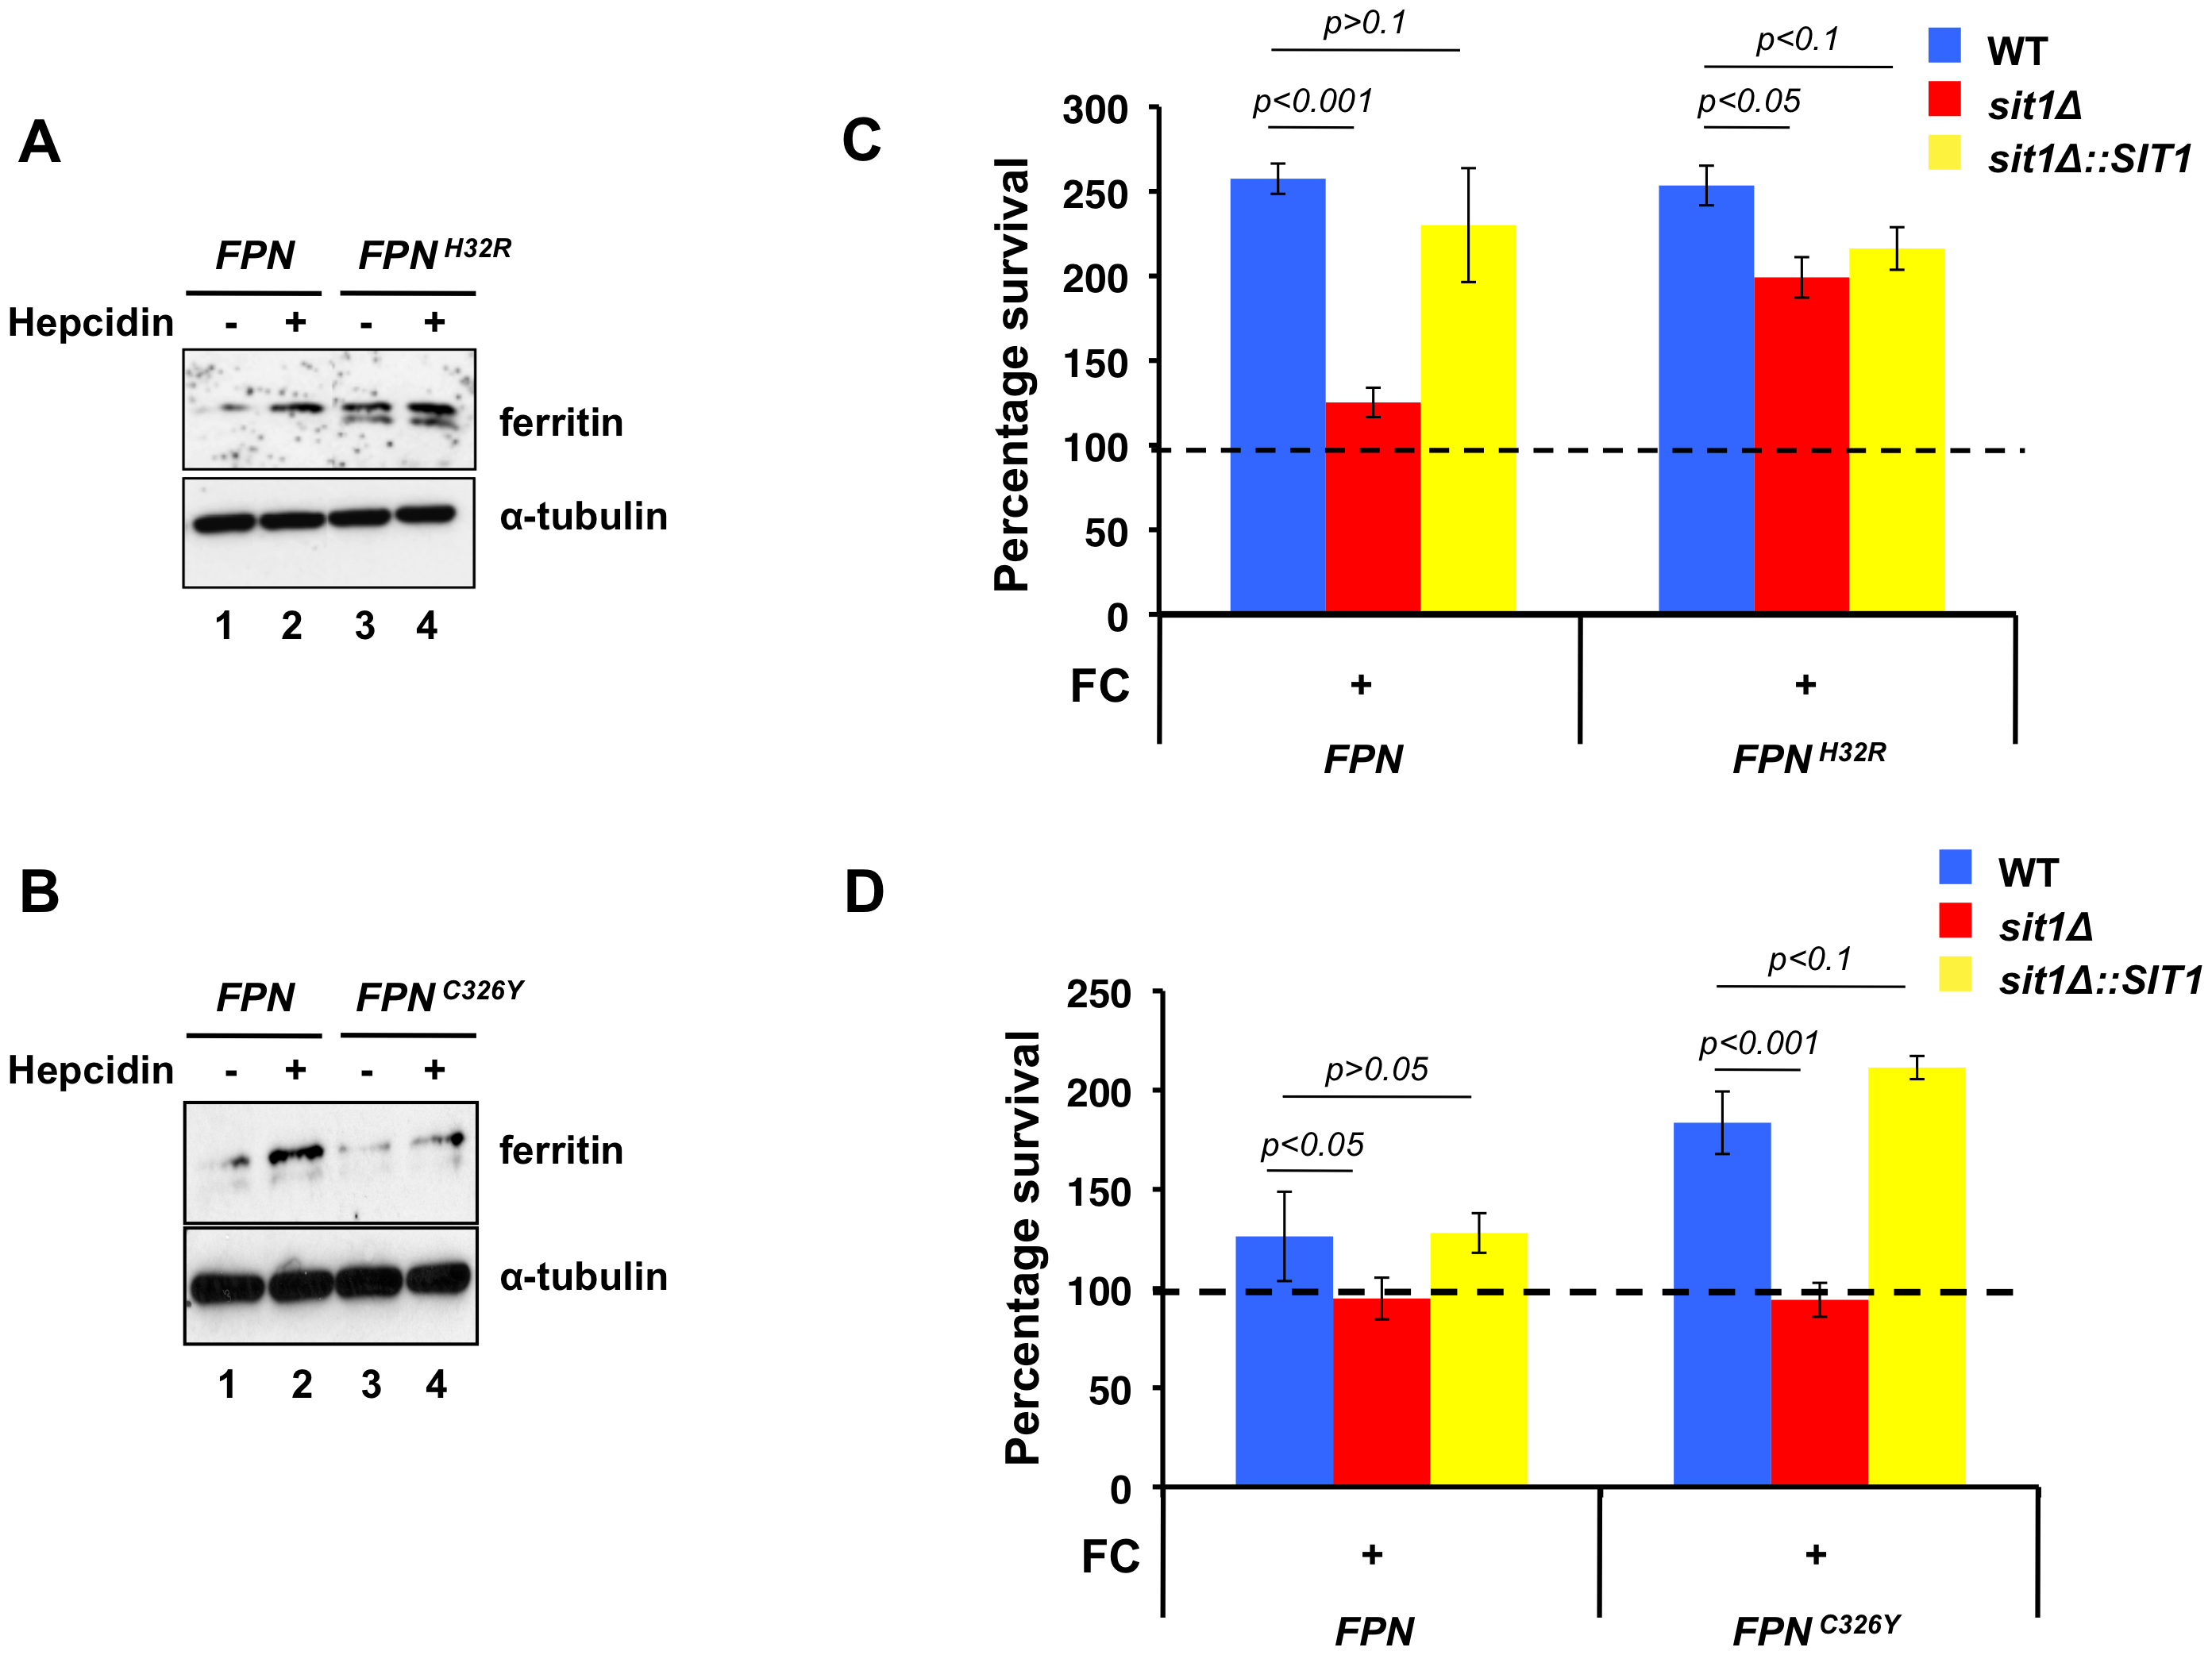 Macrophage models of Fe homeostasis disease modulate survival of <i>C. glabrata</i> and dependence on siderophore Fe.